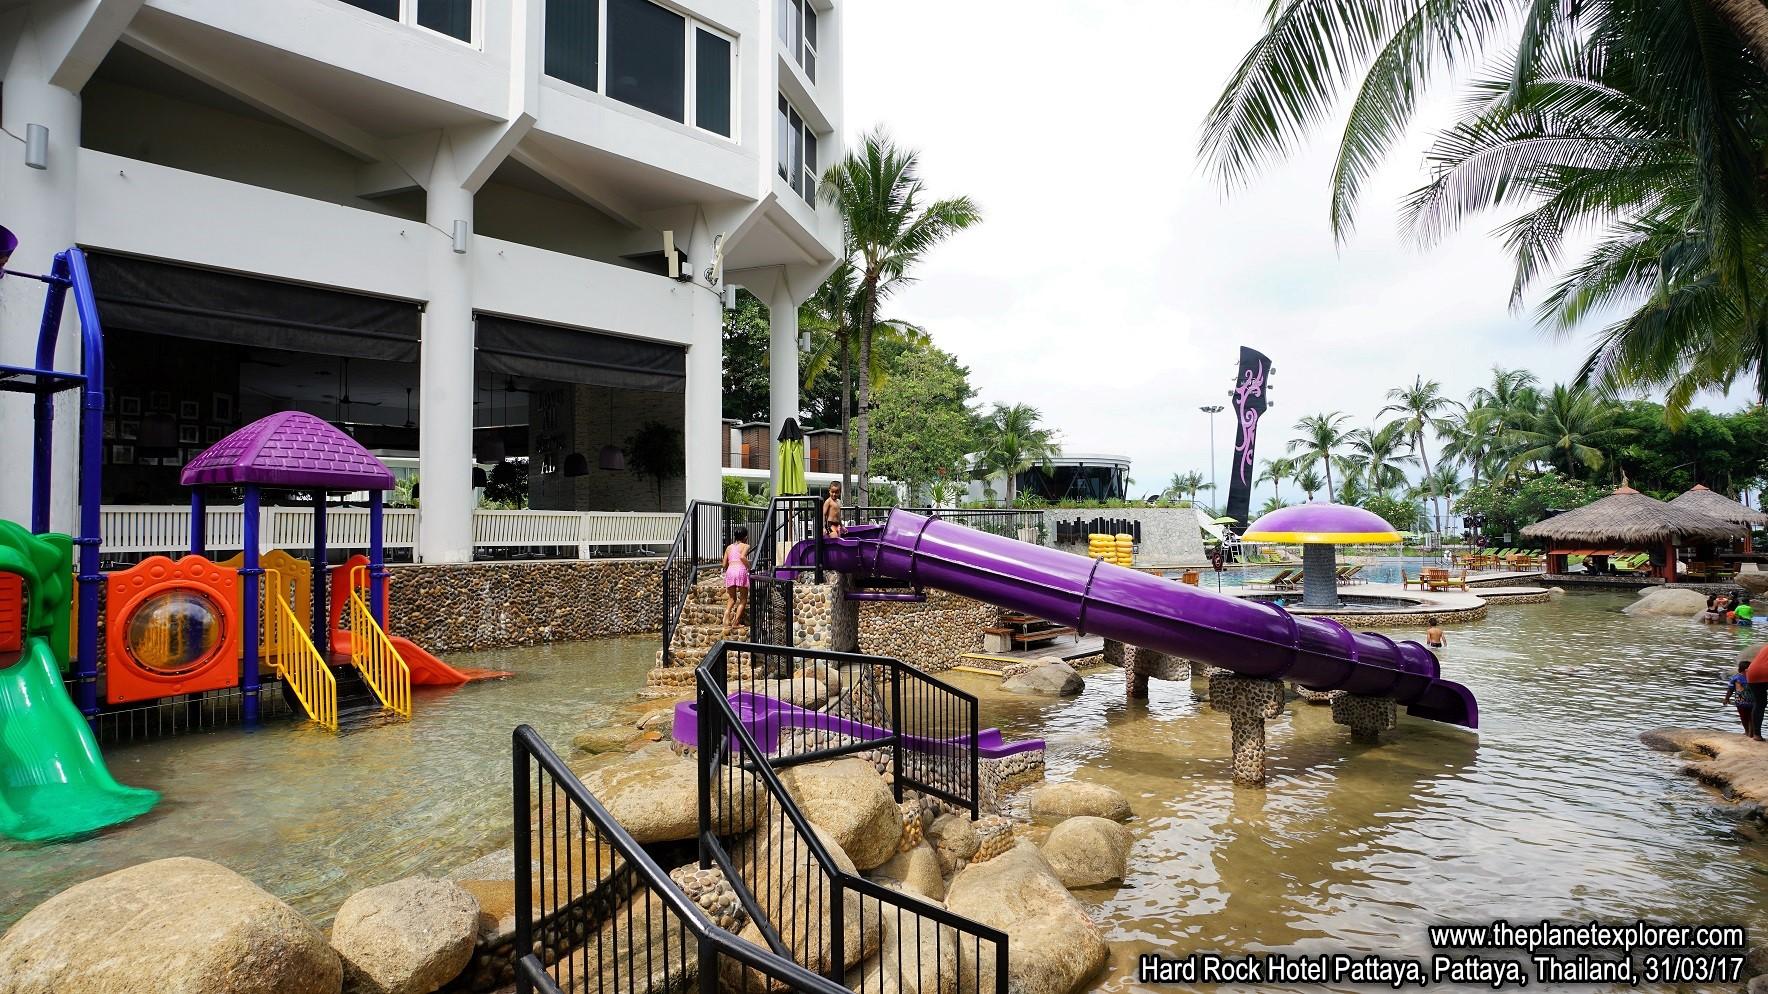 2017-03-31_1421_Thailand_Pattaya_Hard Rock Hotel Pattaya_DSC04154_s7R2_LR_@